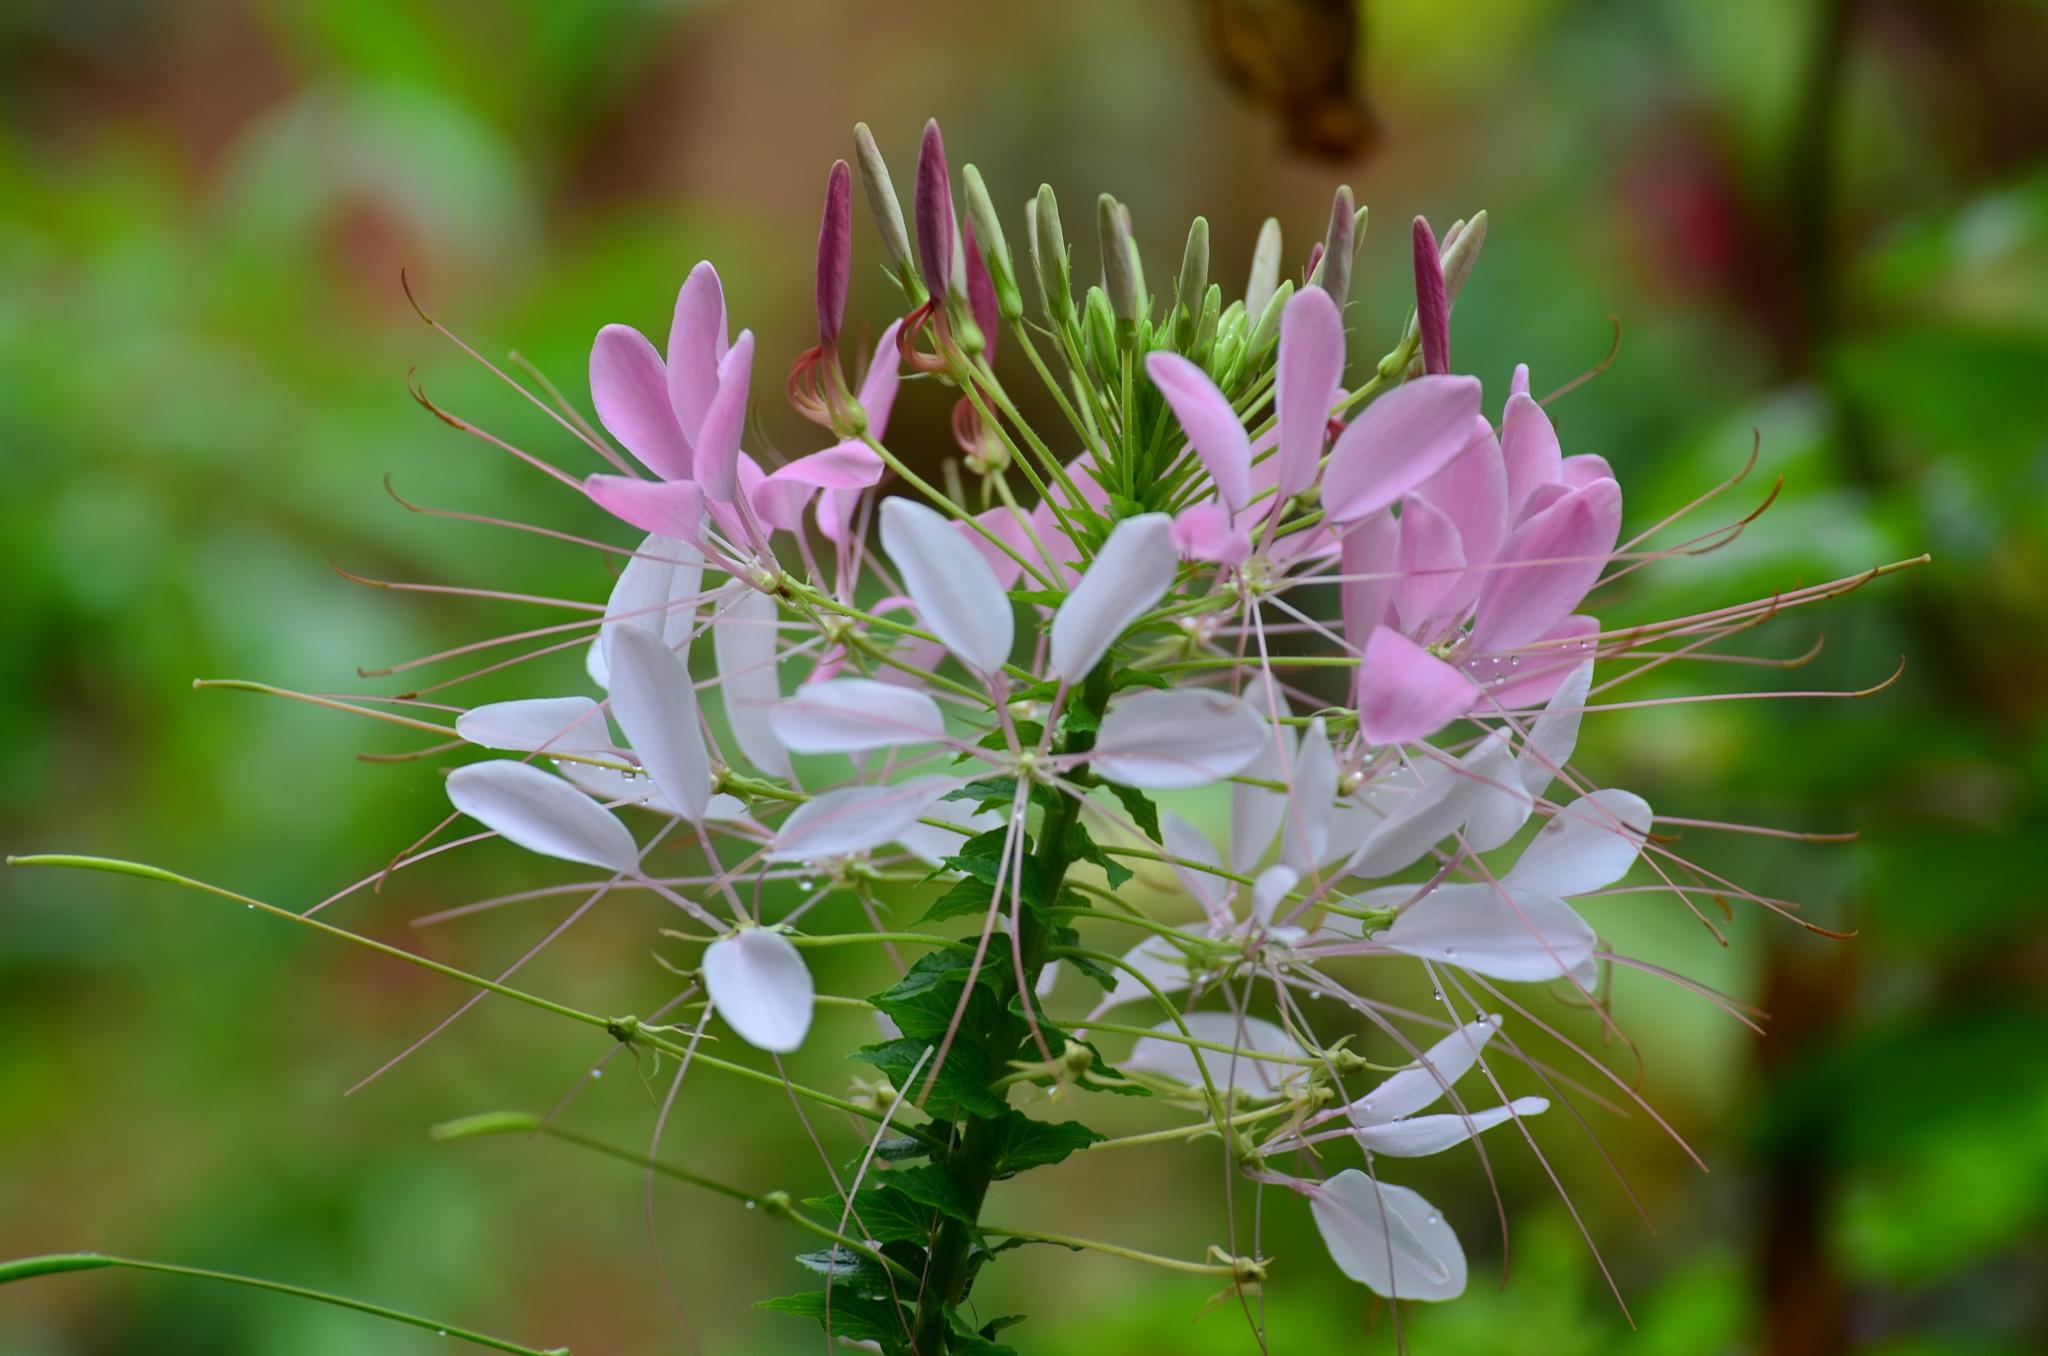 Flower by Shrenik Dodhia